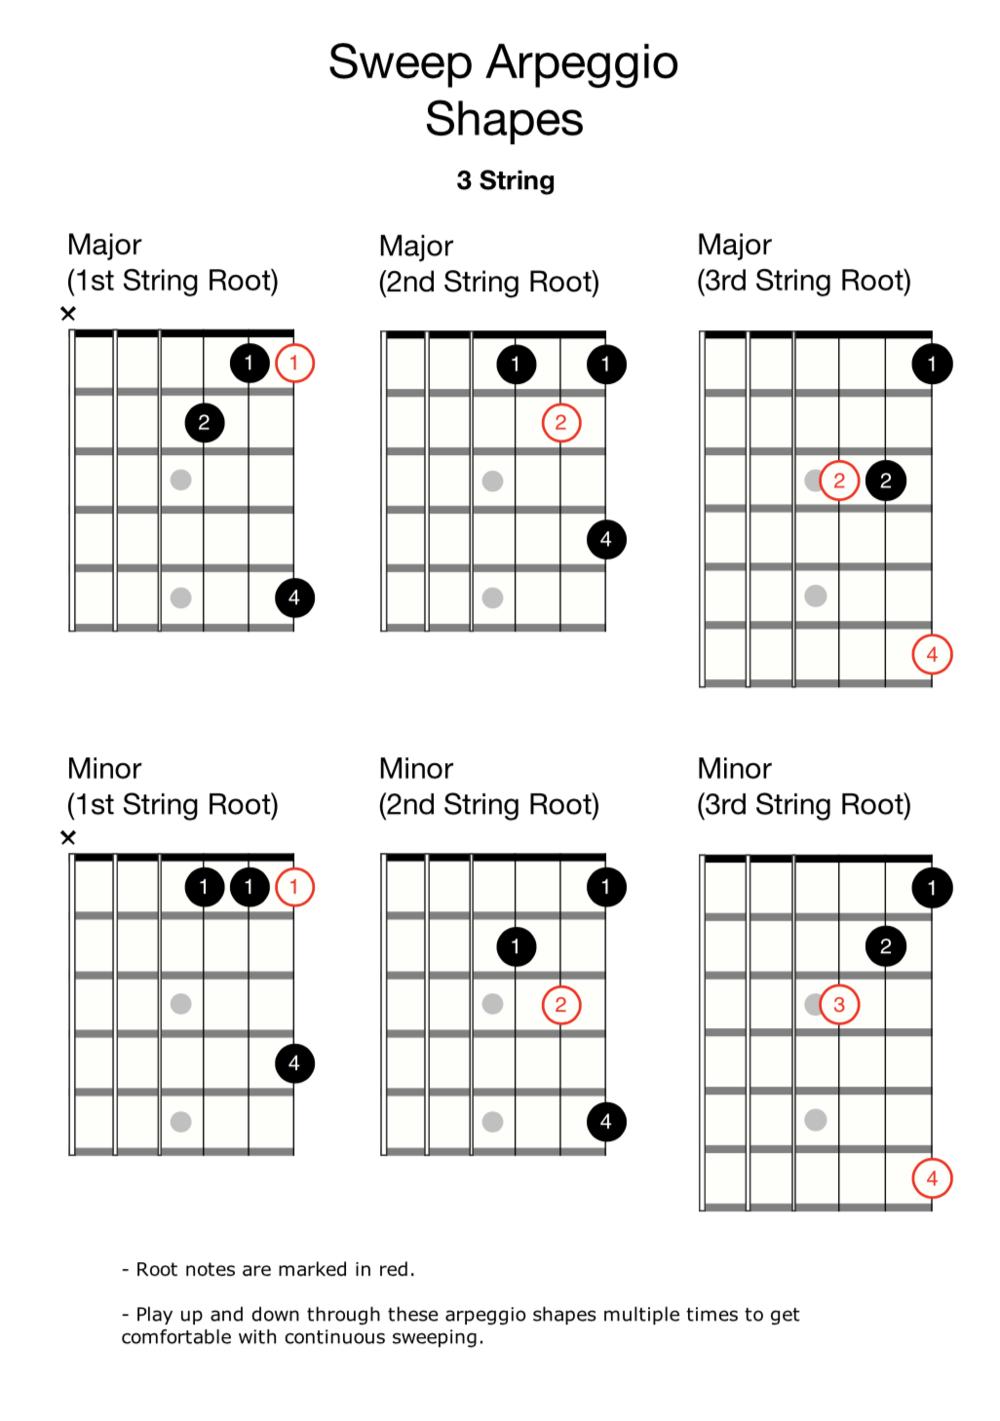 3 String Arpeggio shapes